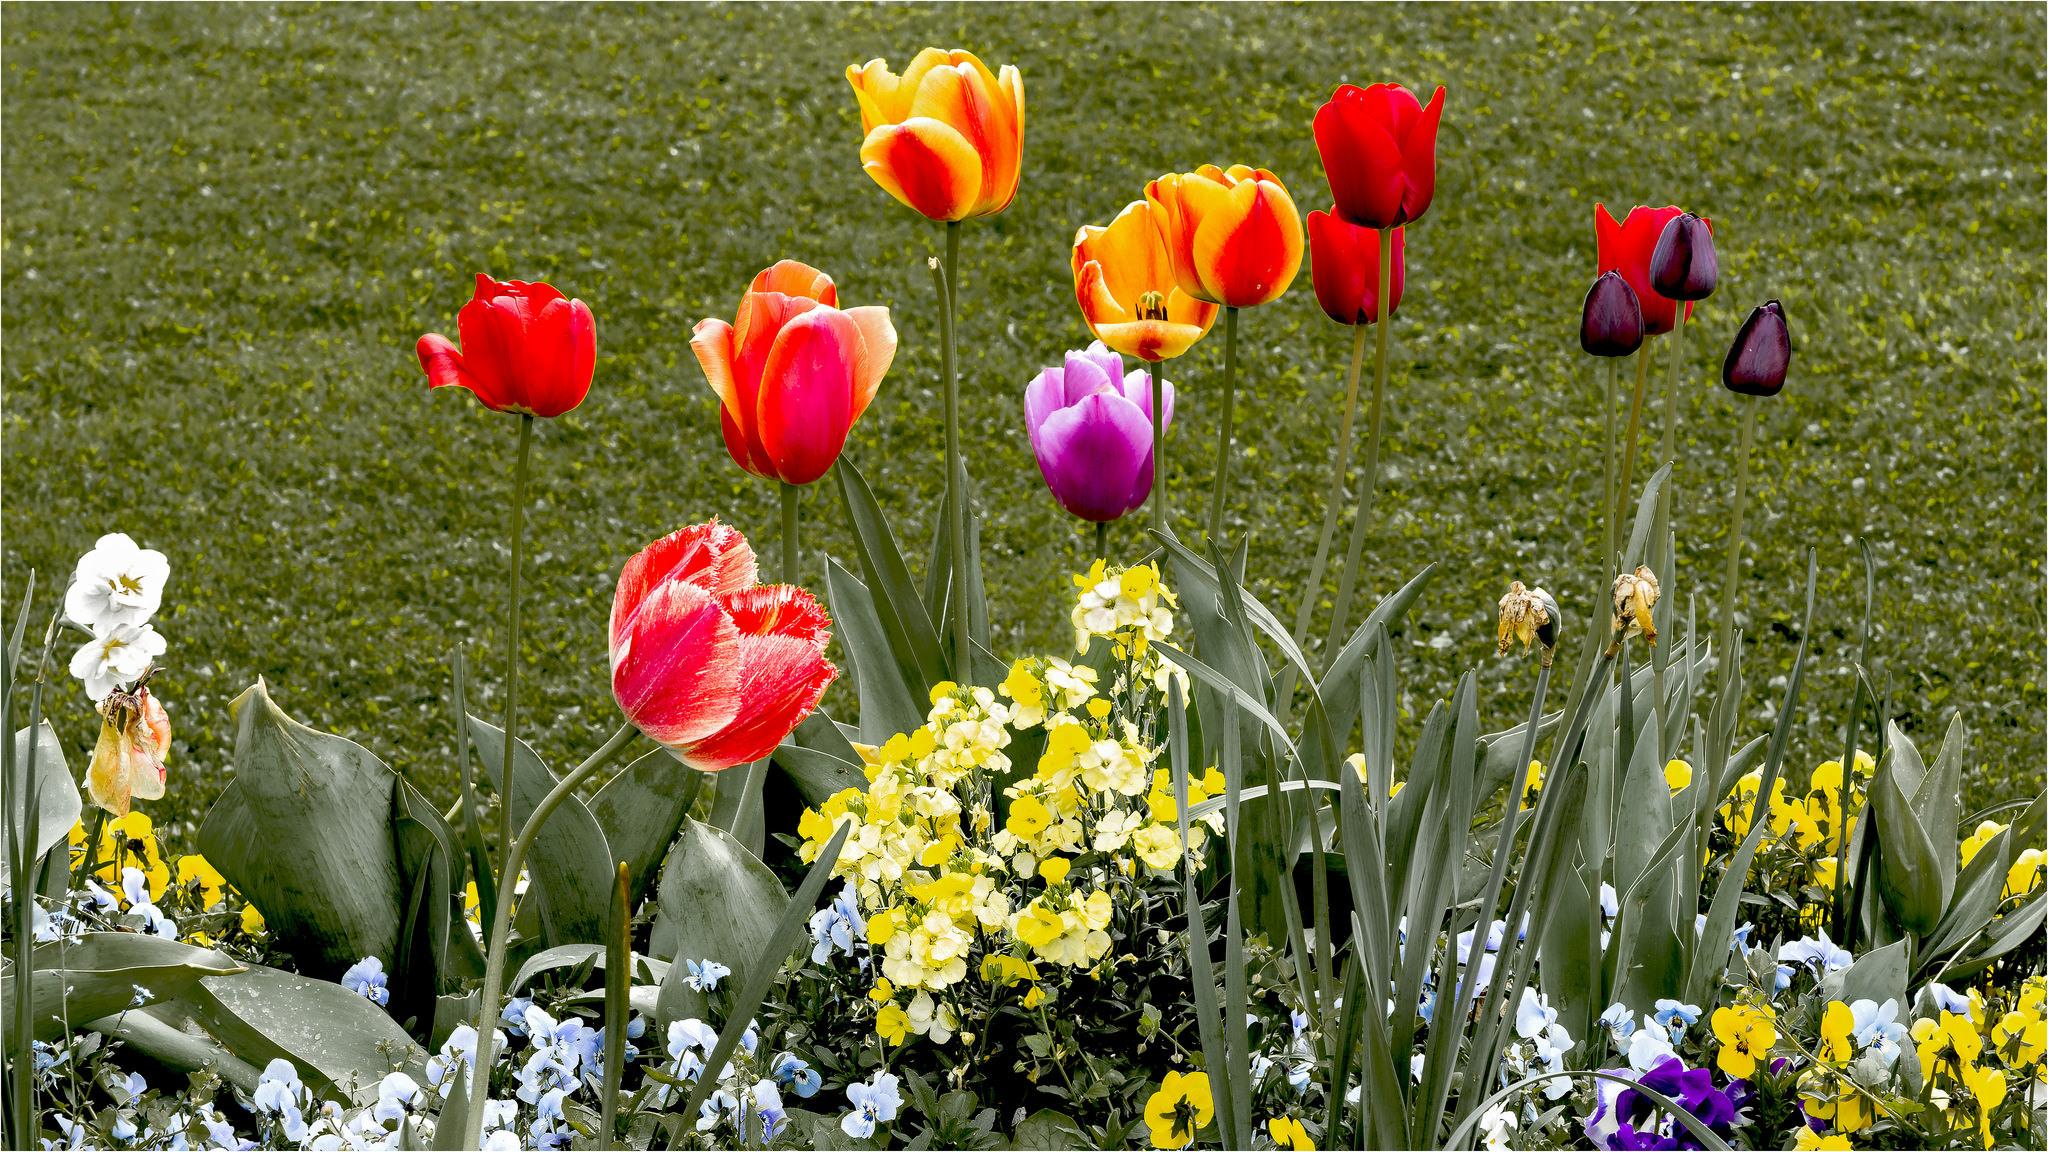 тюльпаны клумба  № 1349360 бесплатно